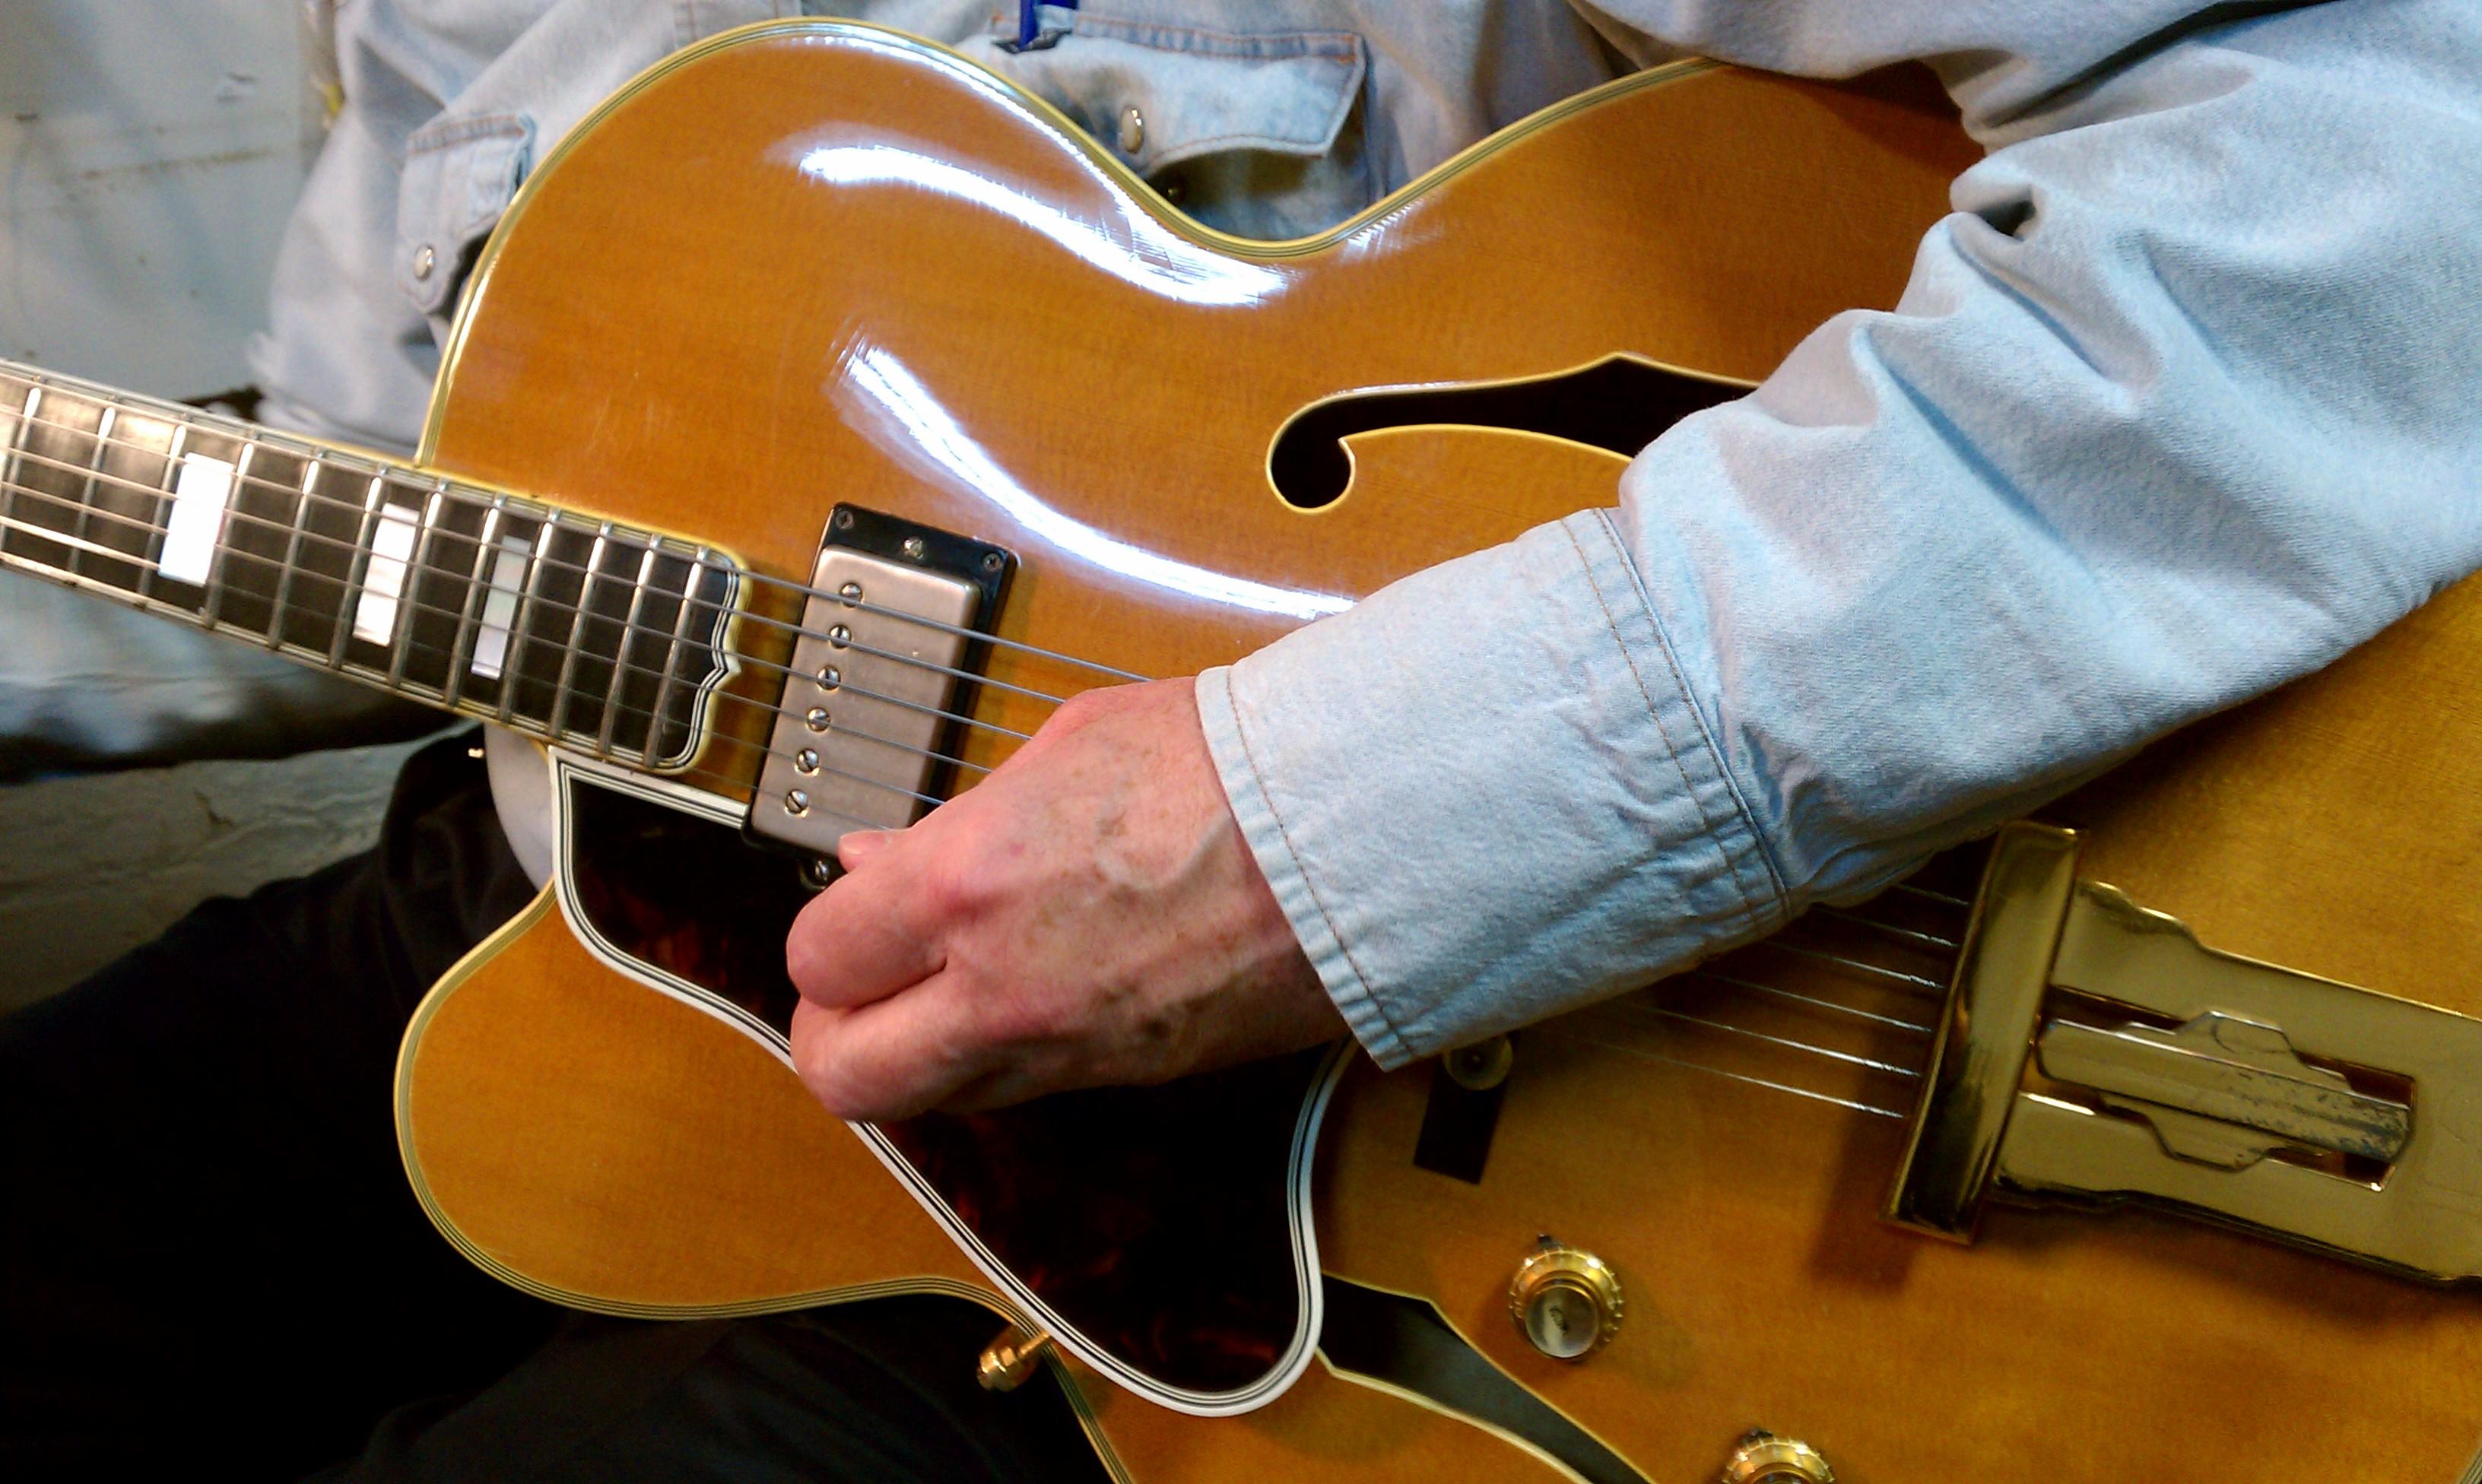 Gibson L 5 Wiring Automotive Diagram 1959 L5 Ct George Gobel Model Cf Restorations Rh Cfrestorations Com Epiphone Hollow Body Style Guitars